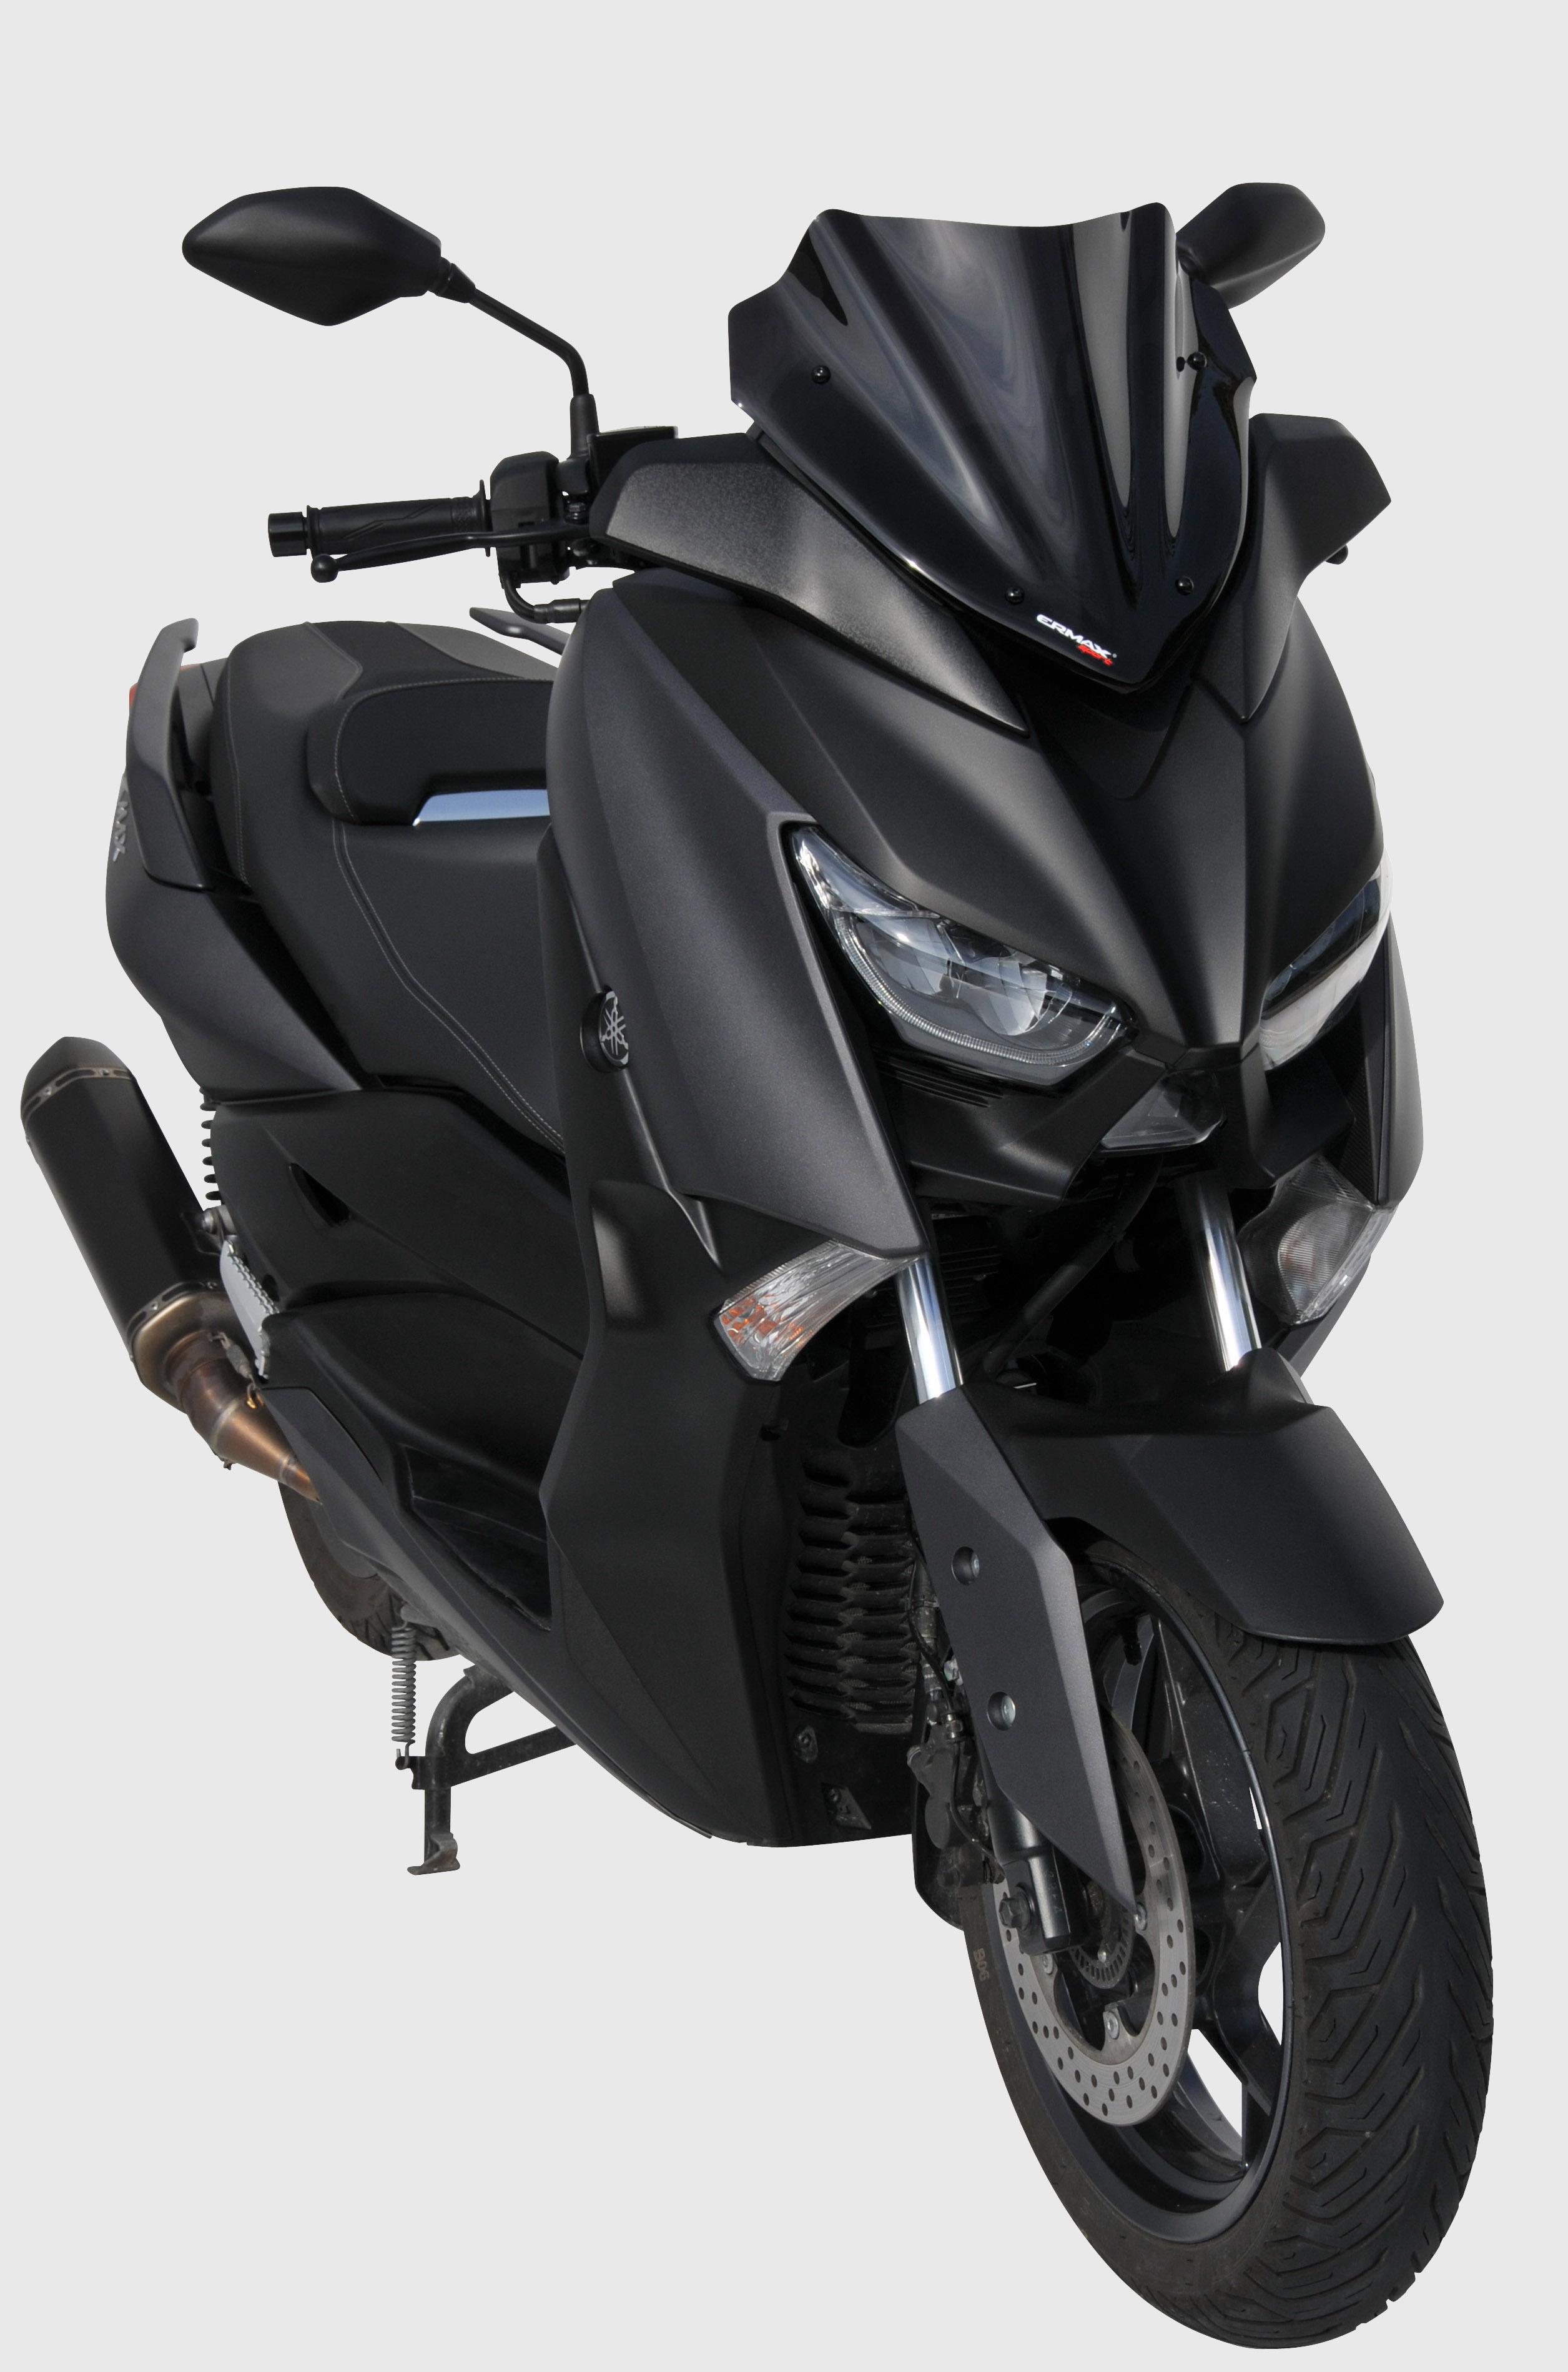 Yamaha Xmax 300 Accessories Indonesia - Foto Yamaha Best Contest